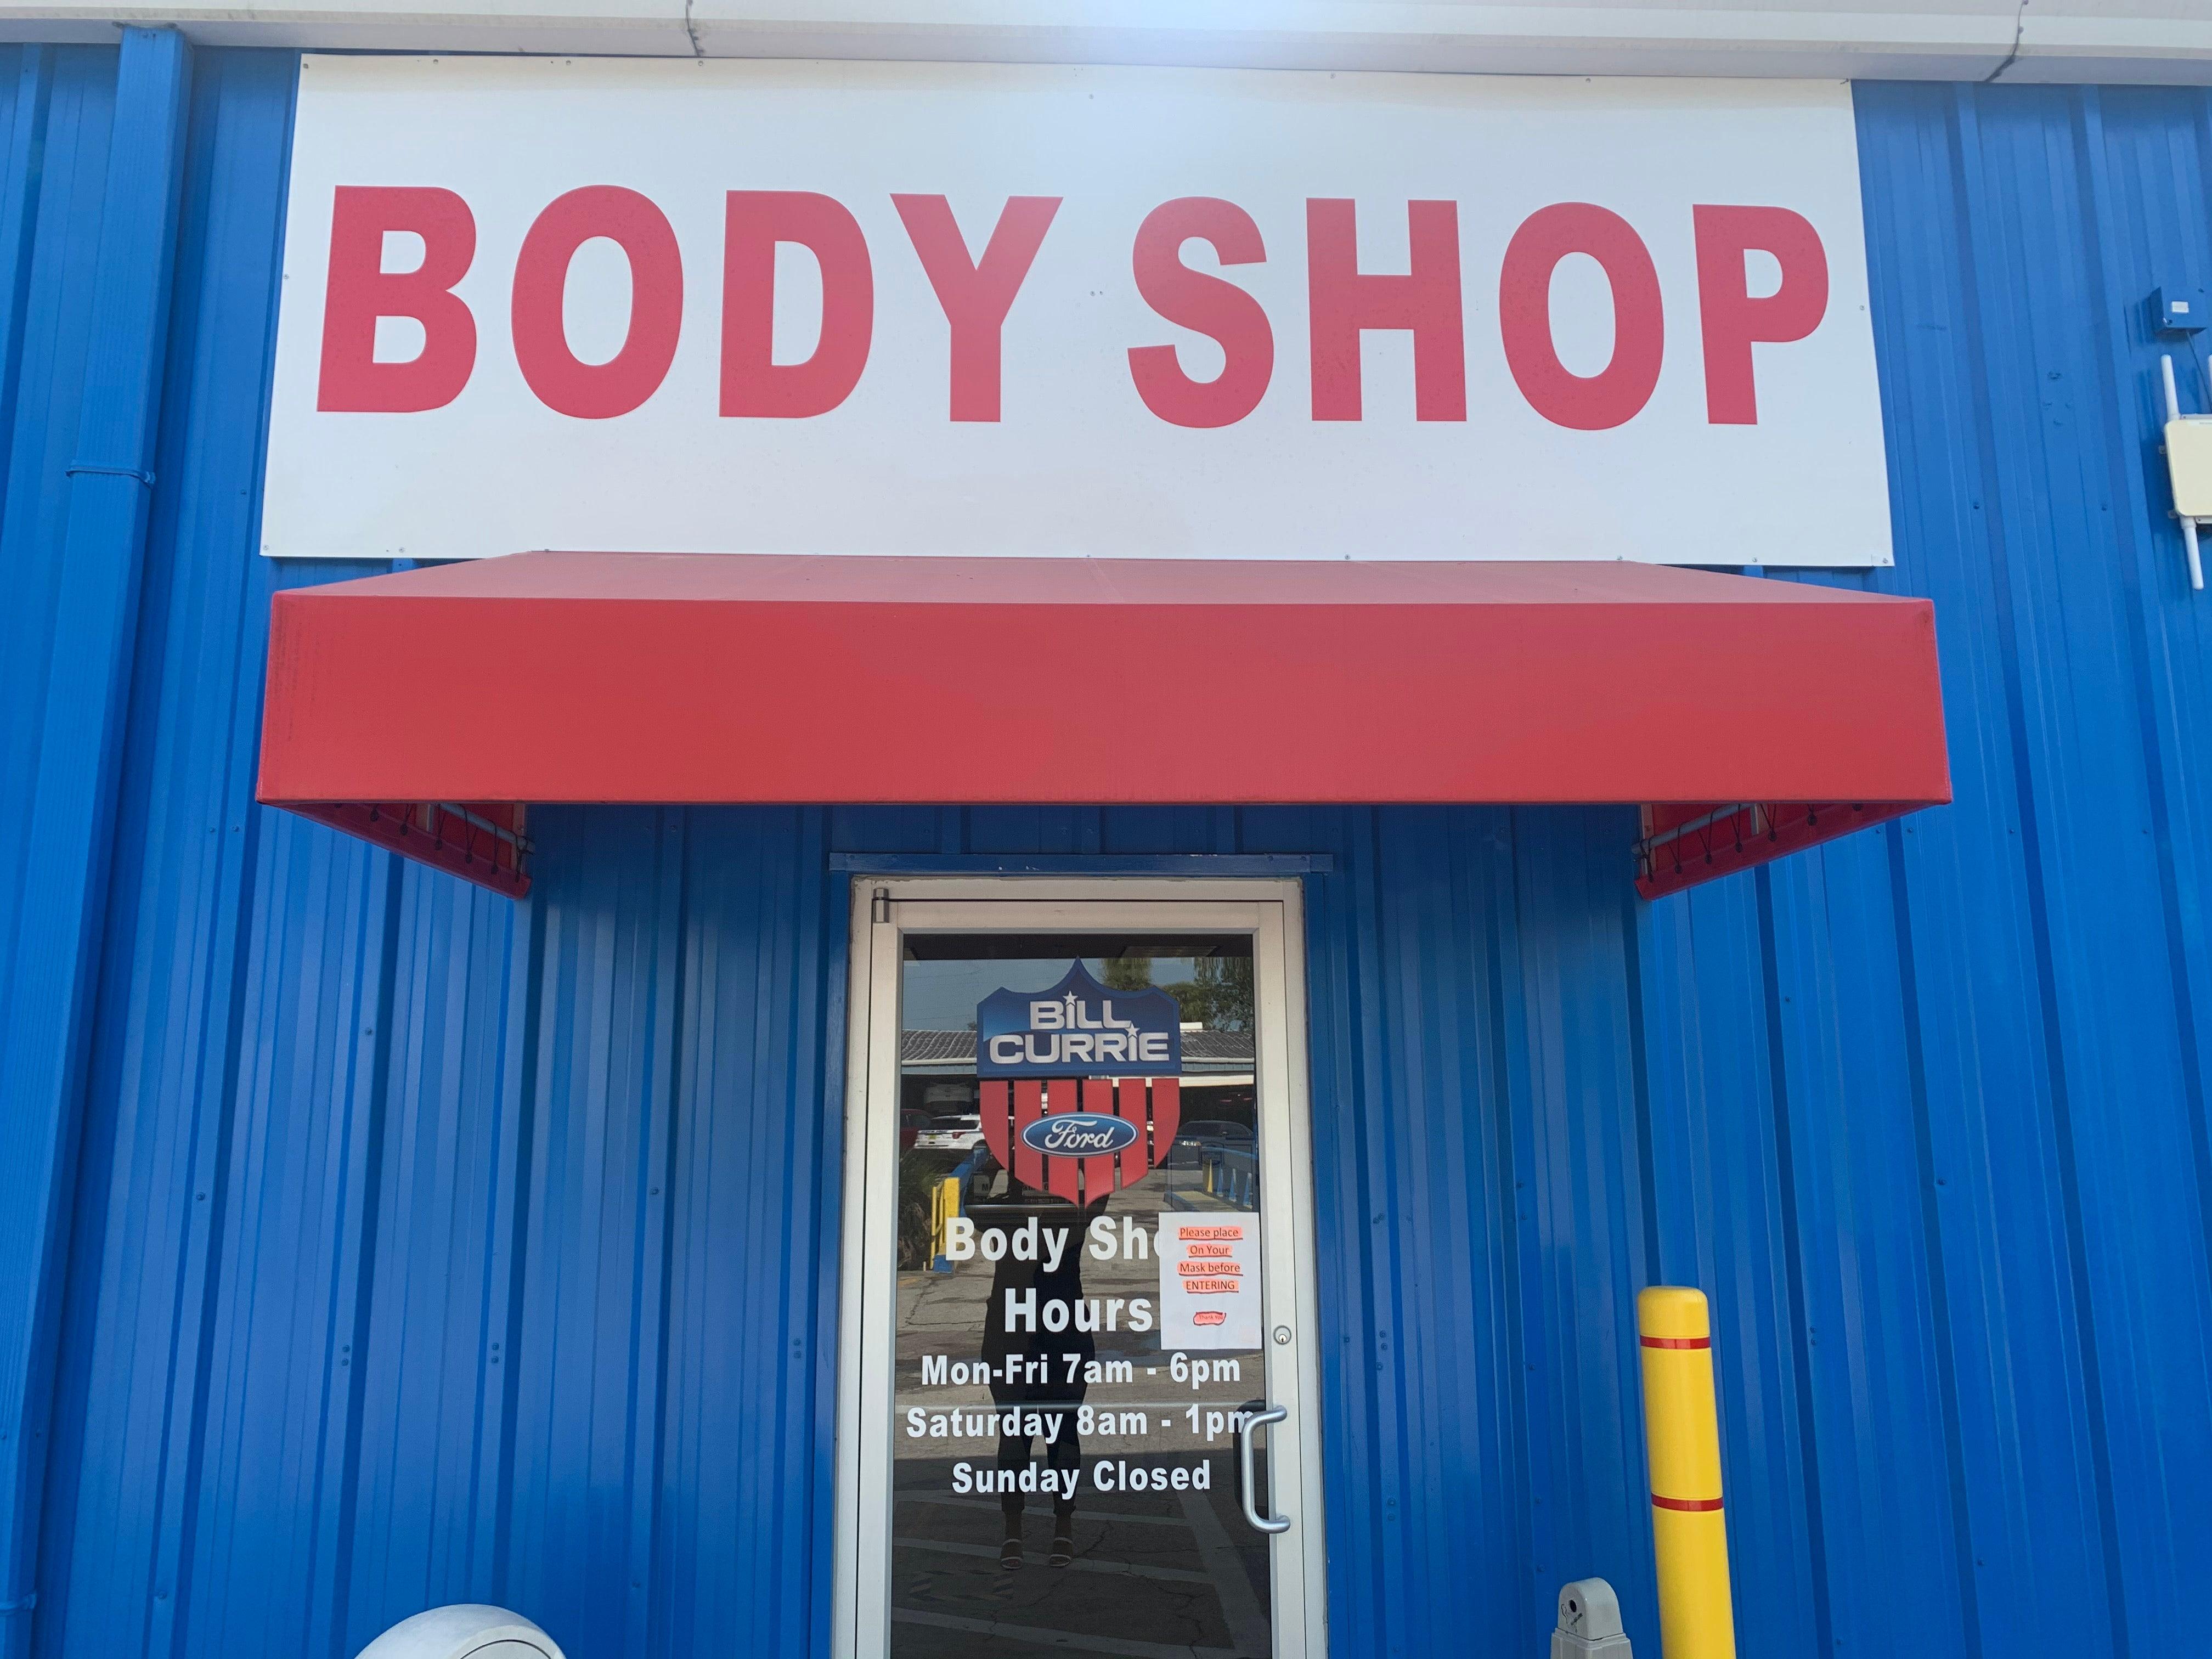 Bill Currie Auto Body Shop in Tampa, FL, Near Town 'n ...